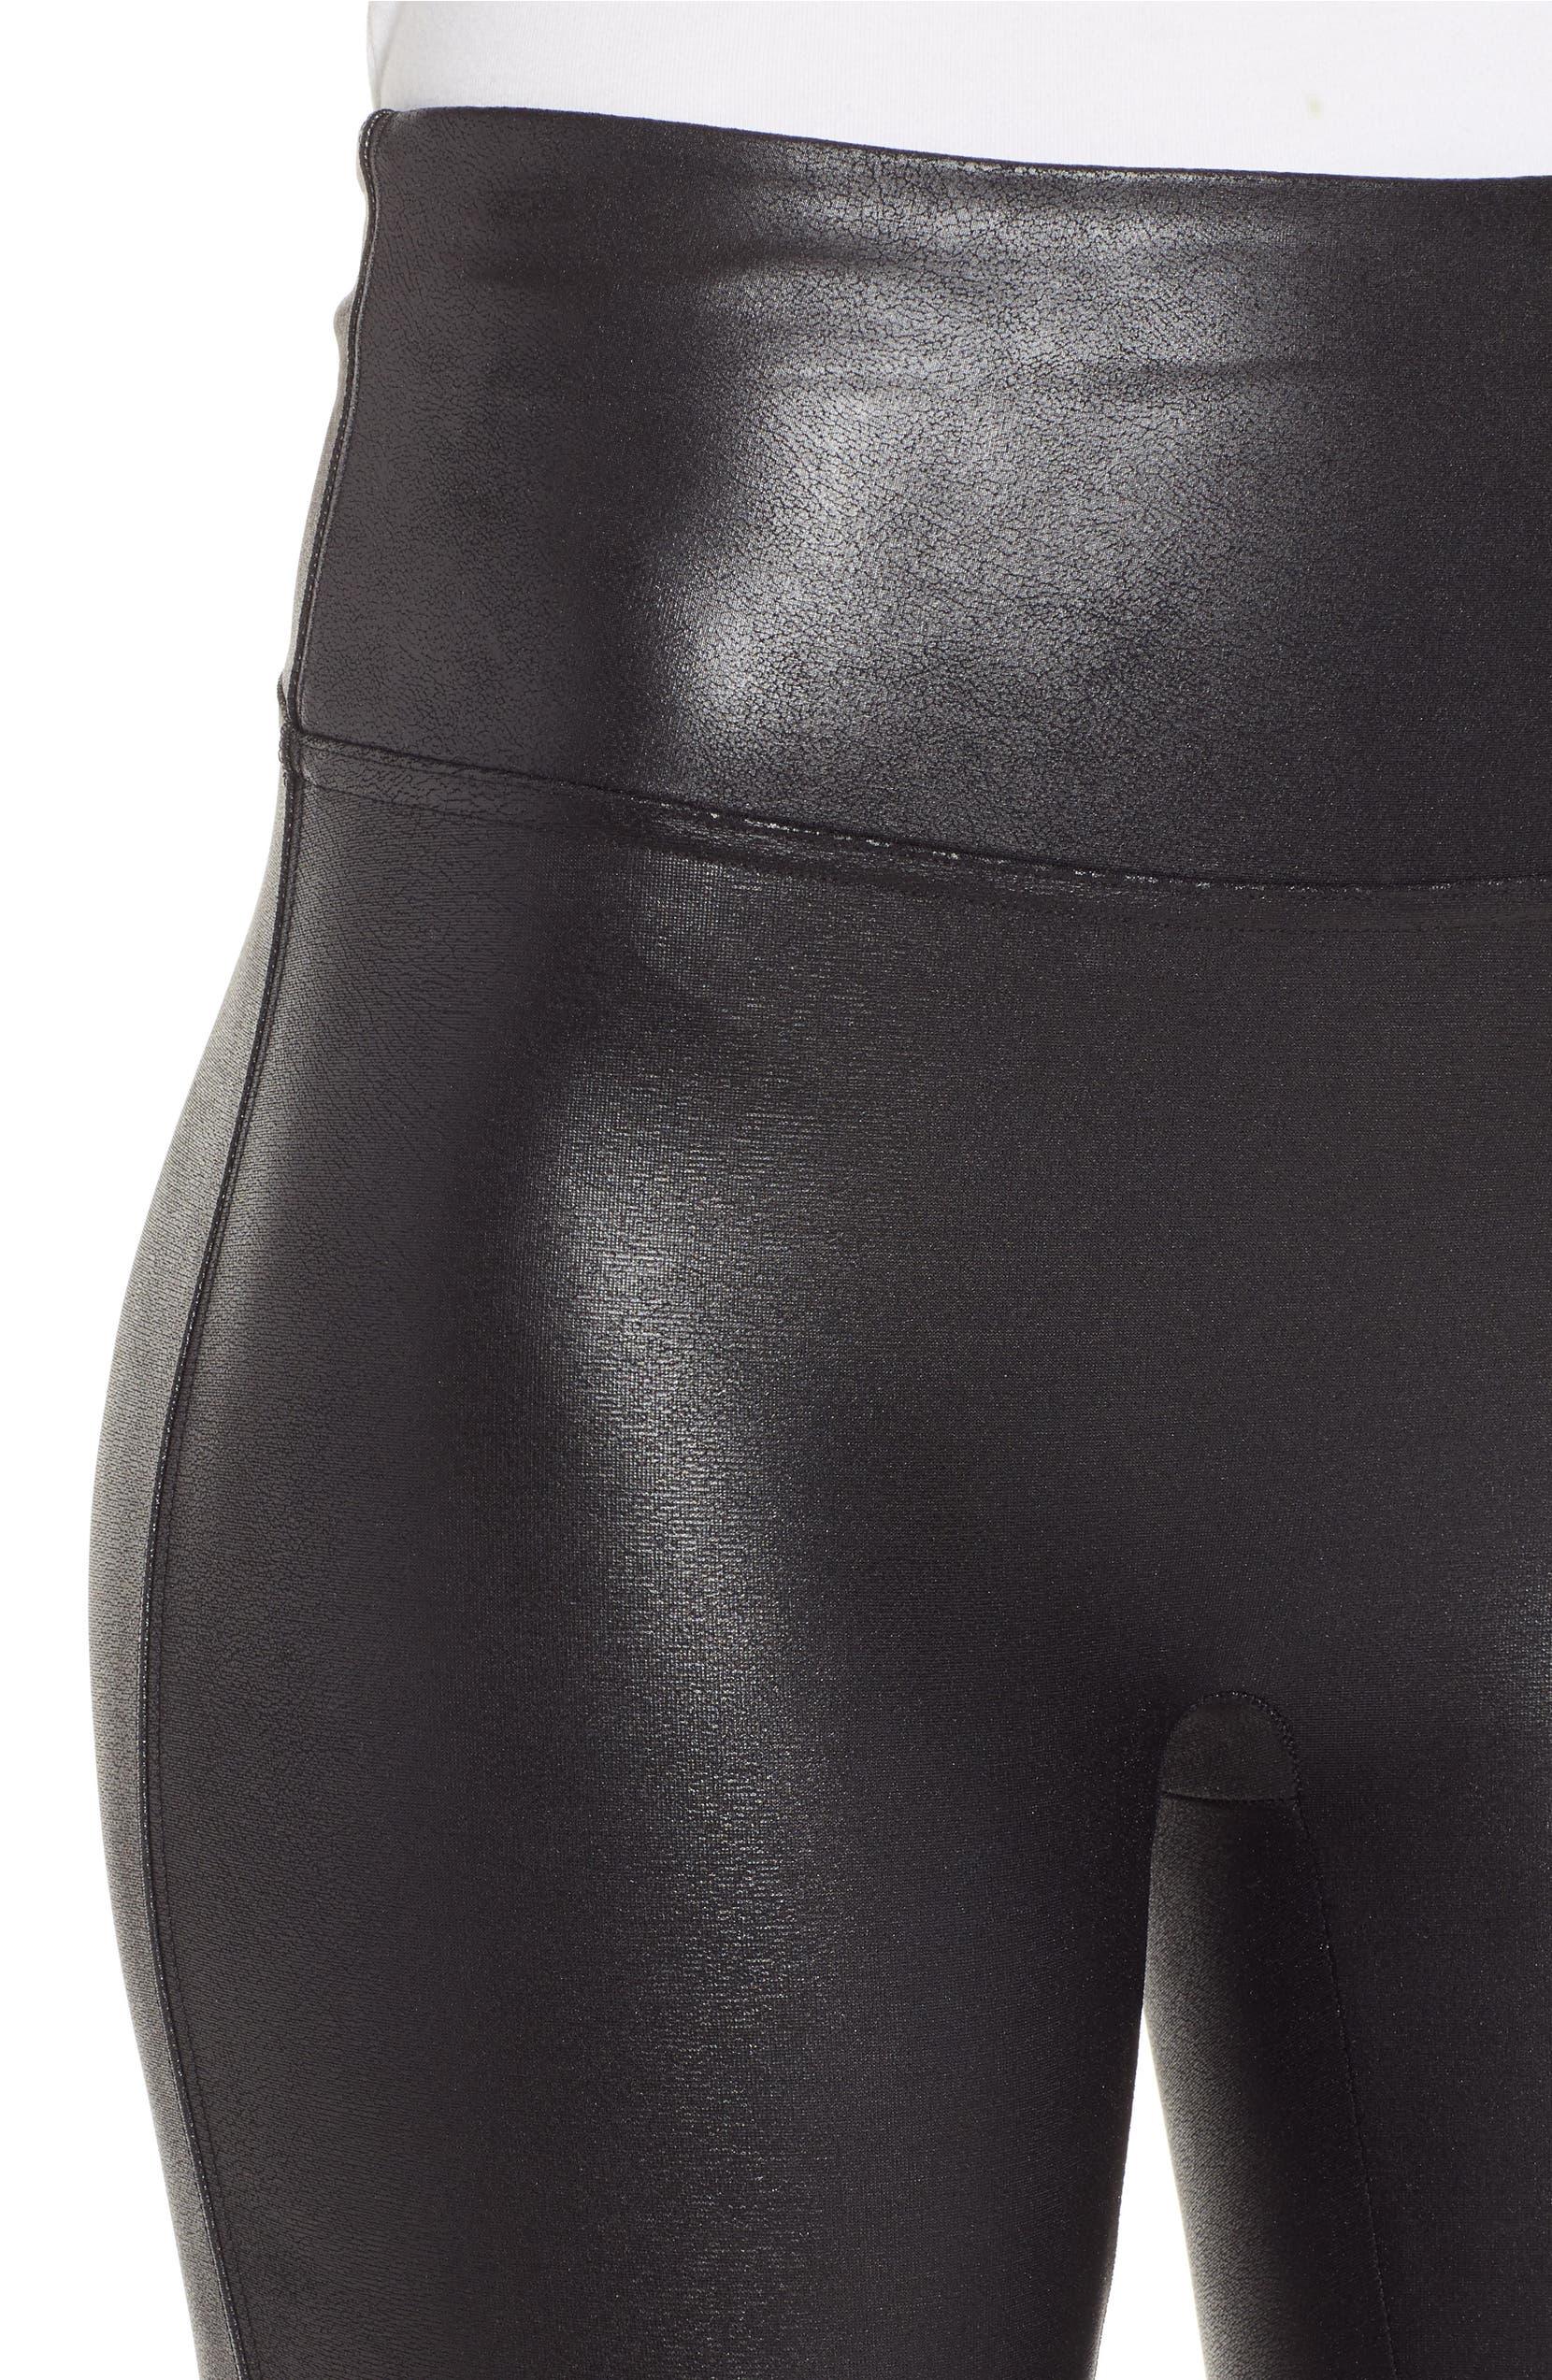 70c975f3ca77 SPANX® Faux Leather Bike Shorts